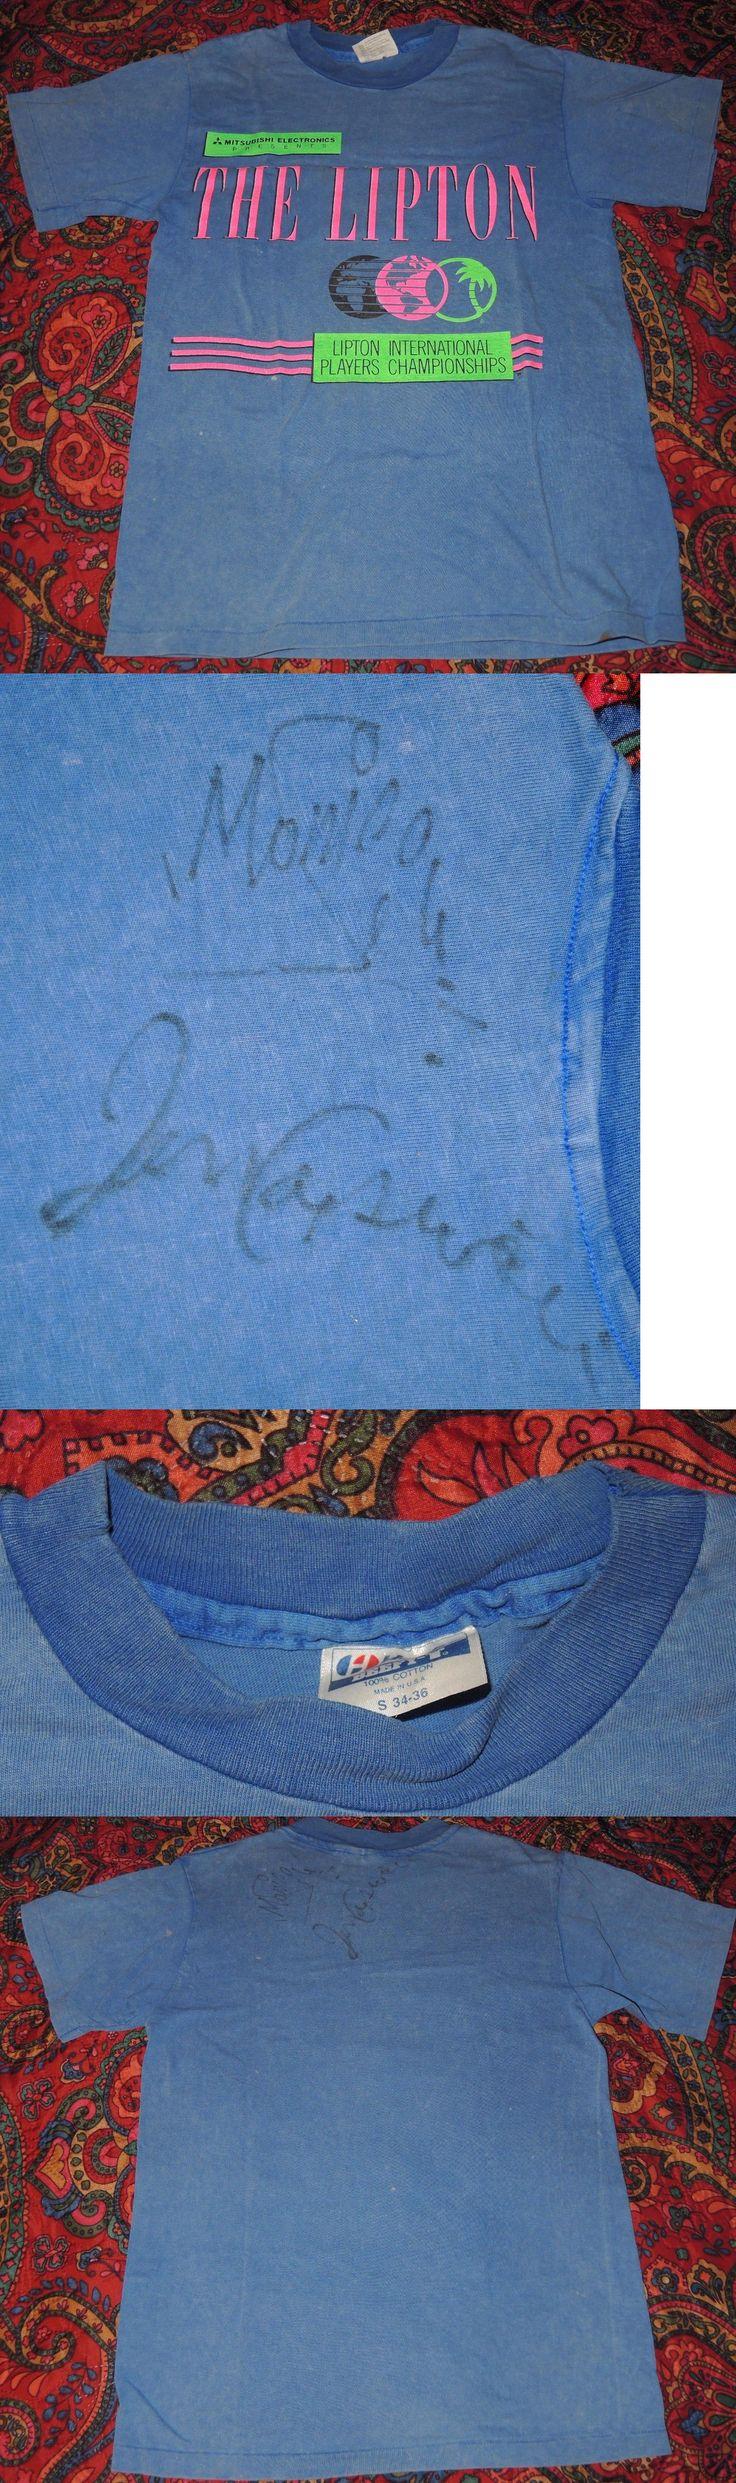 Tennis 430: Vintage 1990 Rookies Monica Seles Jennifer Capriati Signed Miami Tennis T-Shirt -> BUY IT NOW ONLY: $79.95 on eBay!